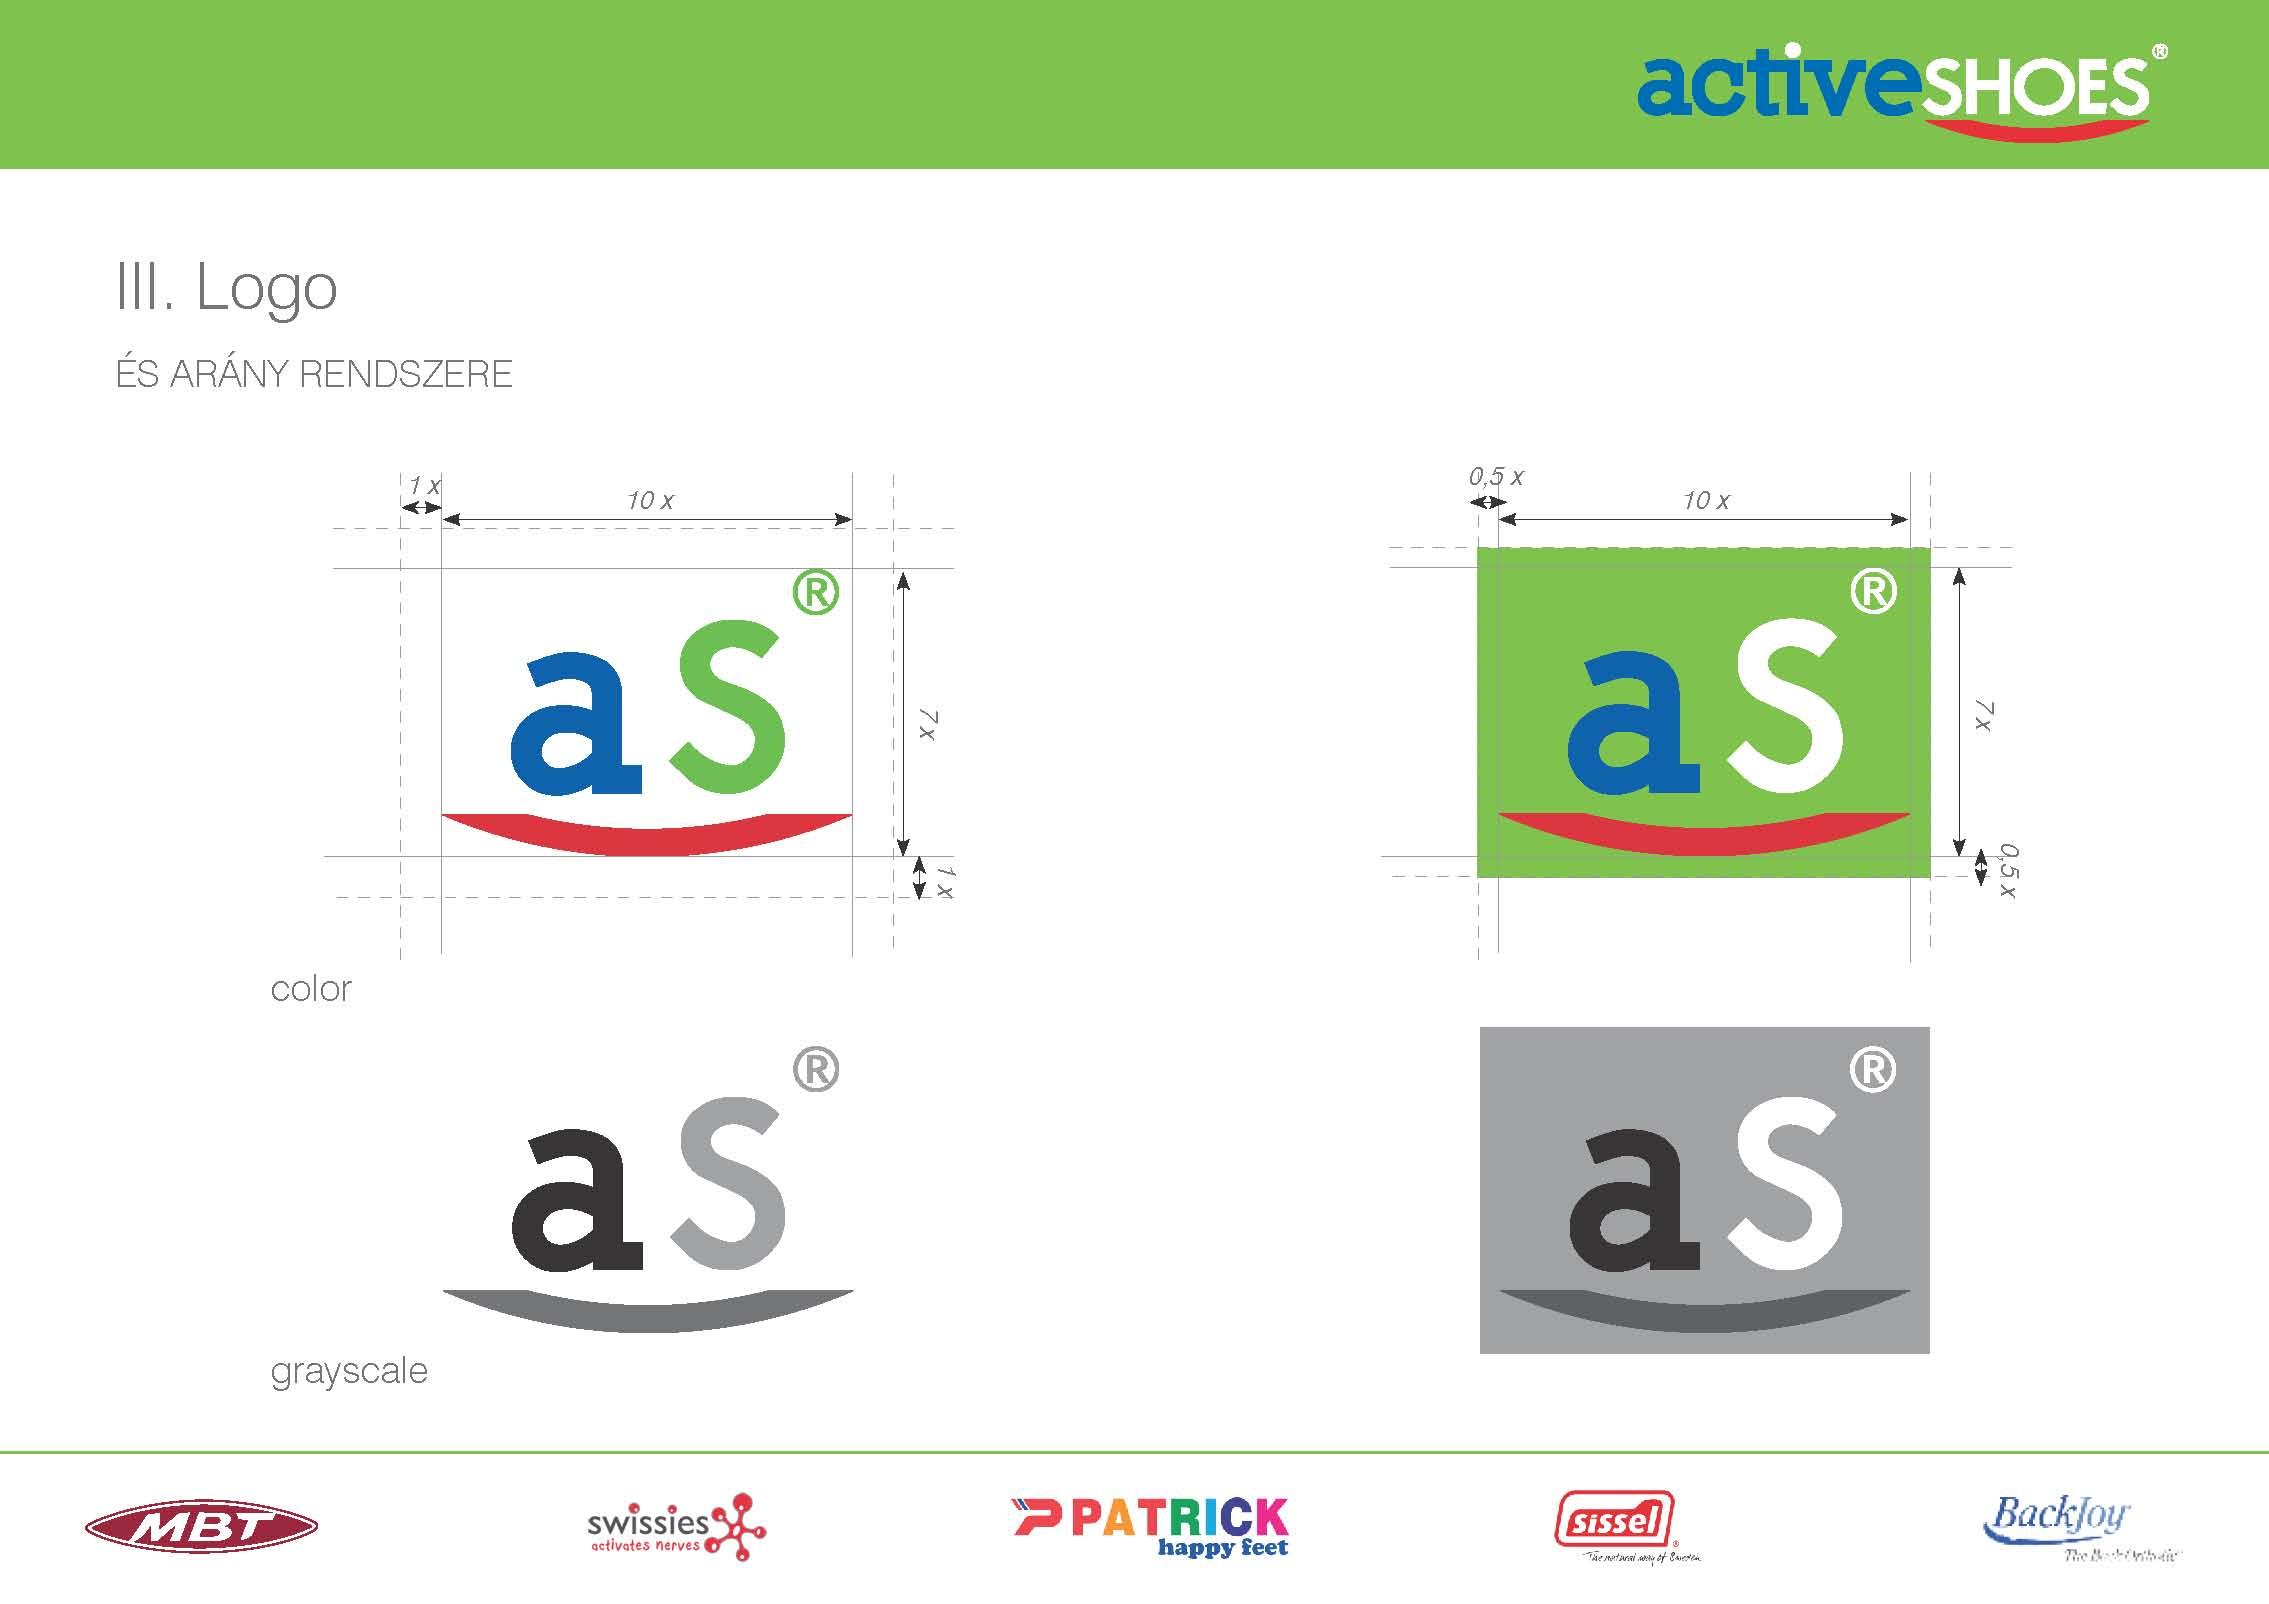 activeshoes_designbook_2011_07_A4-es_4_Page_05